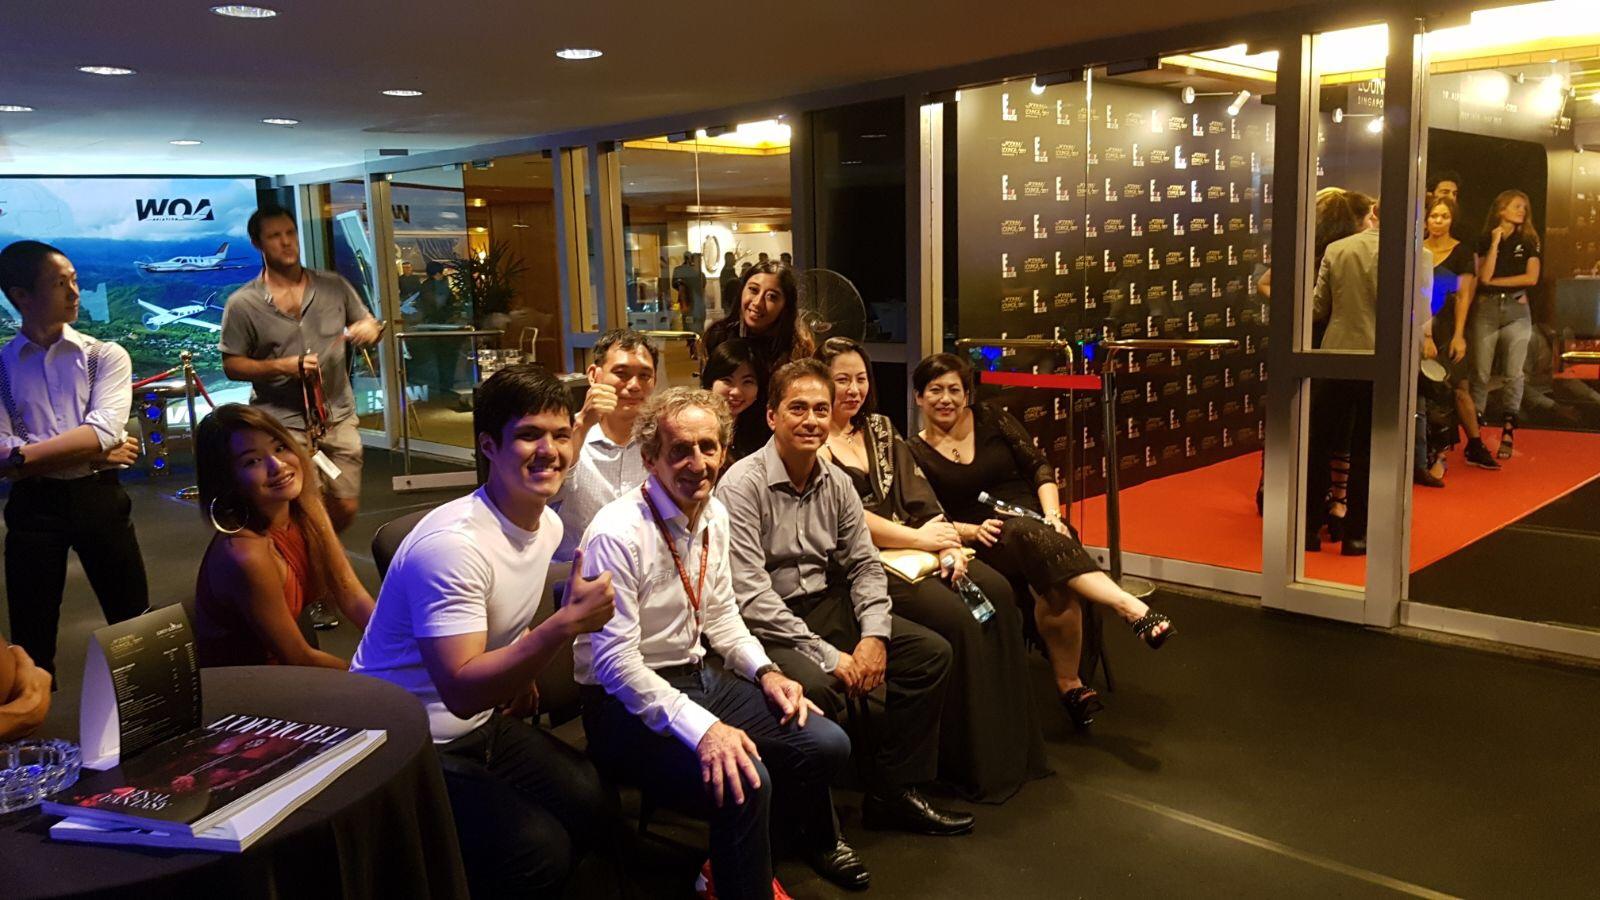 WOA F1 Podium Lounge with F1 Driver